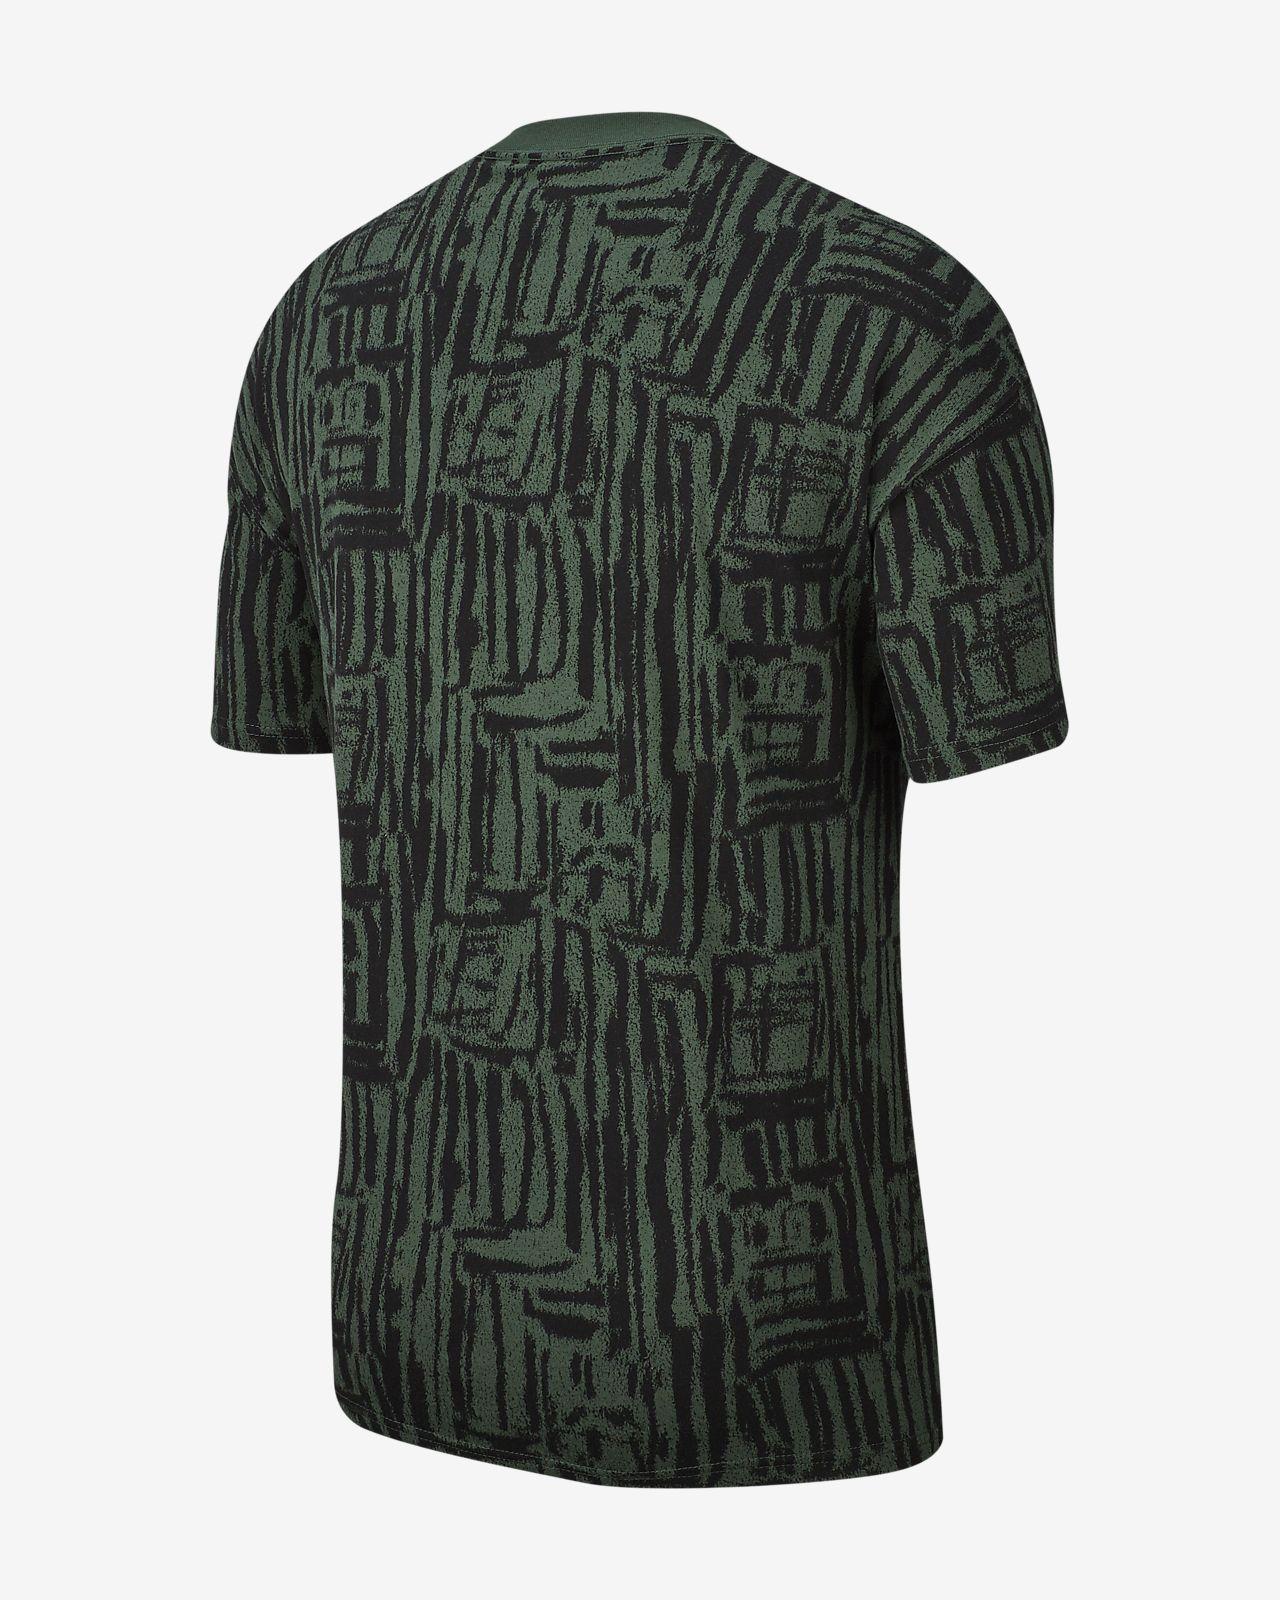 5715a1018842 Ανδρικό κοντομάνικo T-Shirt με σχέδια Nike ACG. Nike.com GR